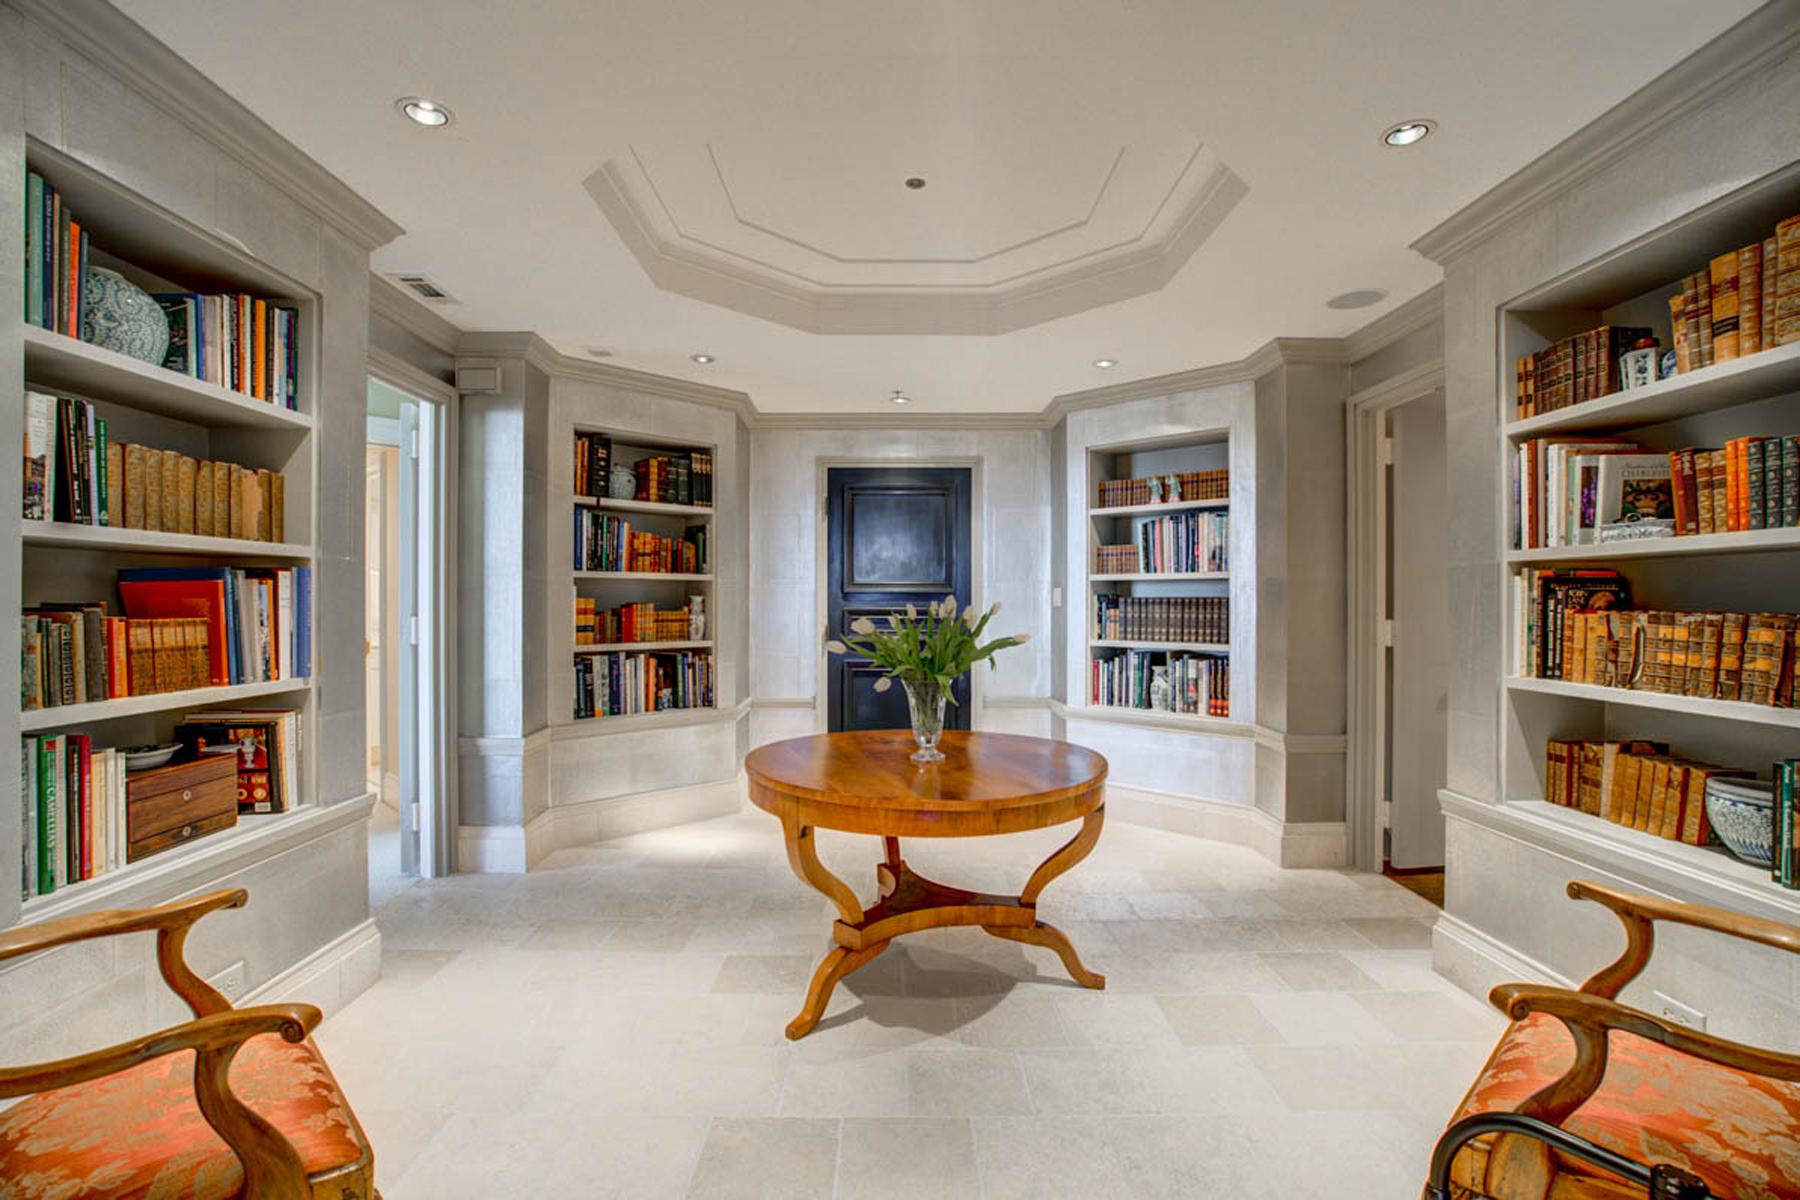 Condominiums для того Продажа на Masterfully Renovated with the Most Spectacular Views 2660 Peachtree Road NW No. 38CD, Atlanta, Джорджия 30305 Соединенные Штаты